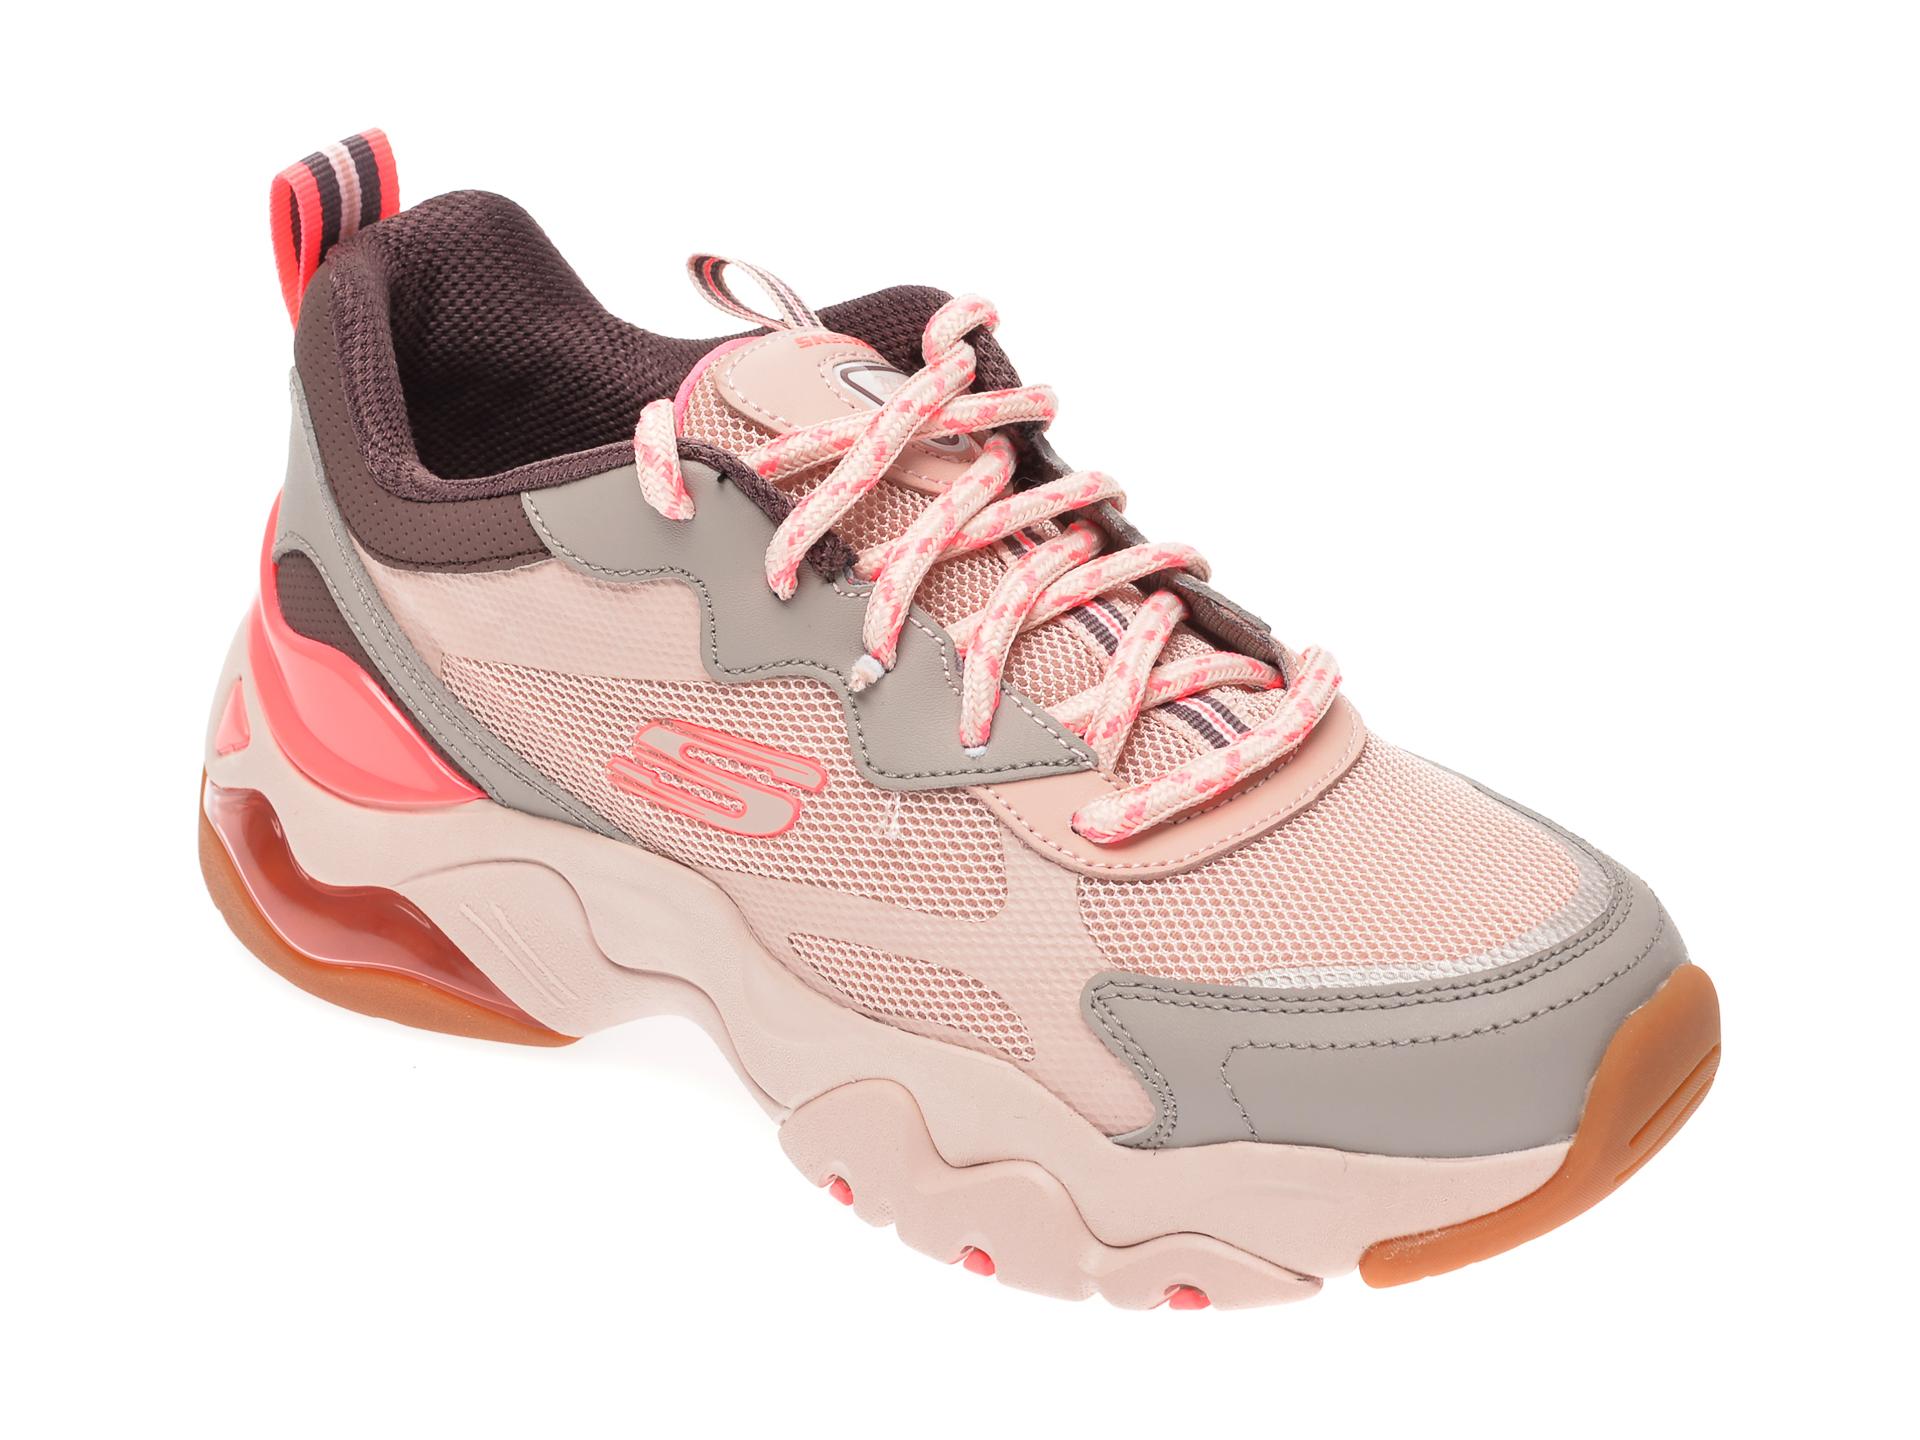 Pantofi sport SKECHERS multicolor, Dlites 3.0 Air, din material textil si piele naturala New